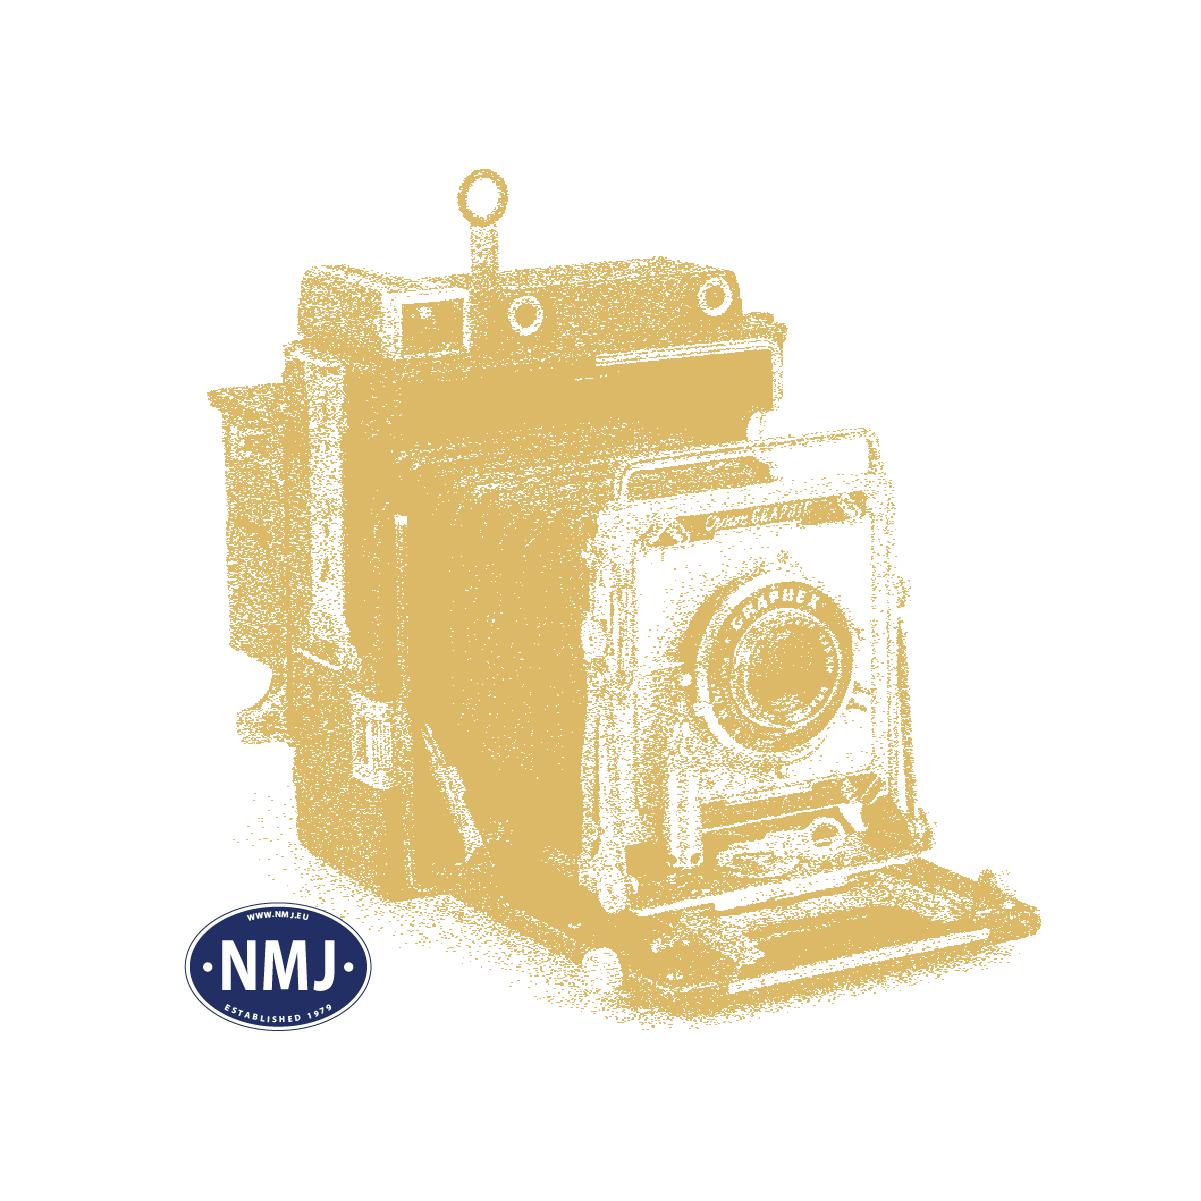 NMJT145002 - NMJ Topline NSB Di3.623 Gammeldesign, 0-Skala